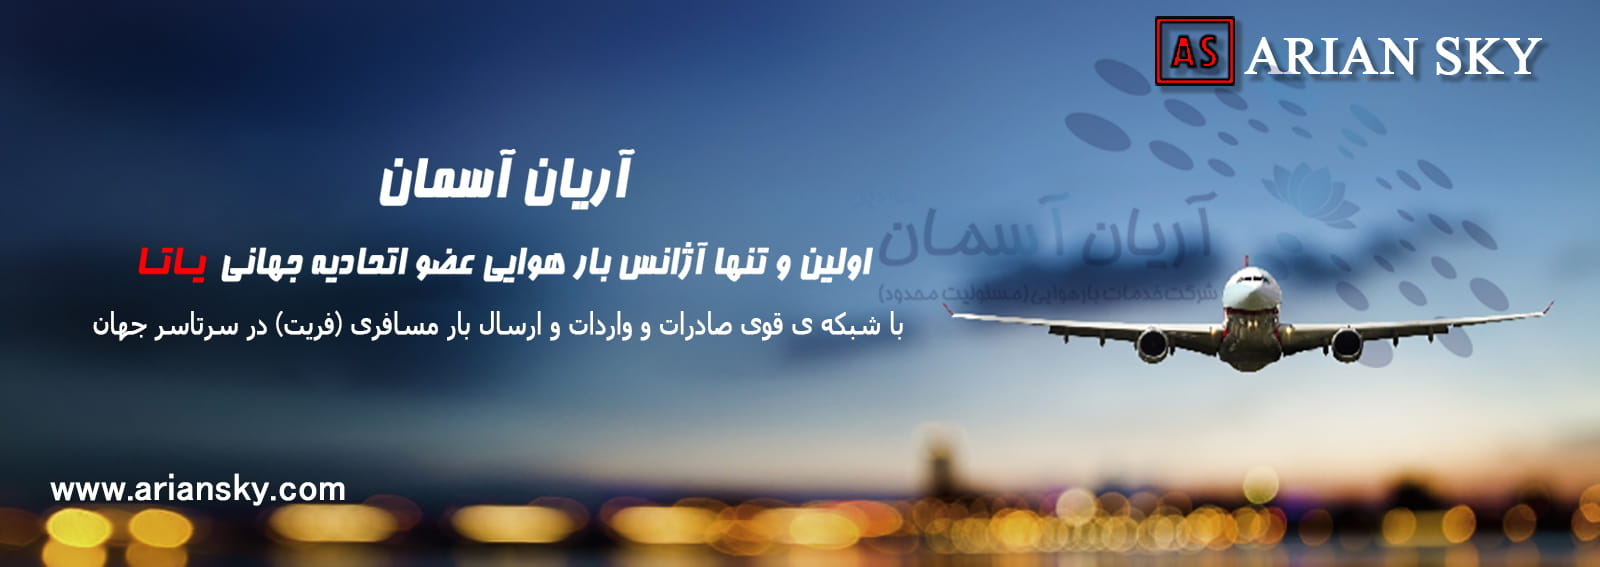 فریت بار مسافری | فریت هوایی لوازم شخصی و لوازم منزل